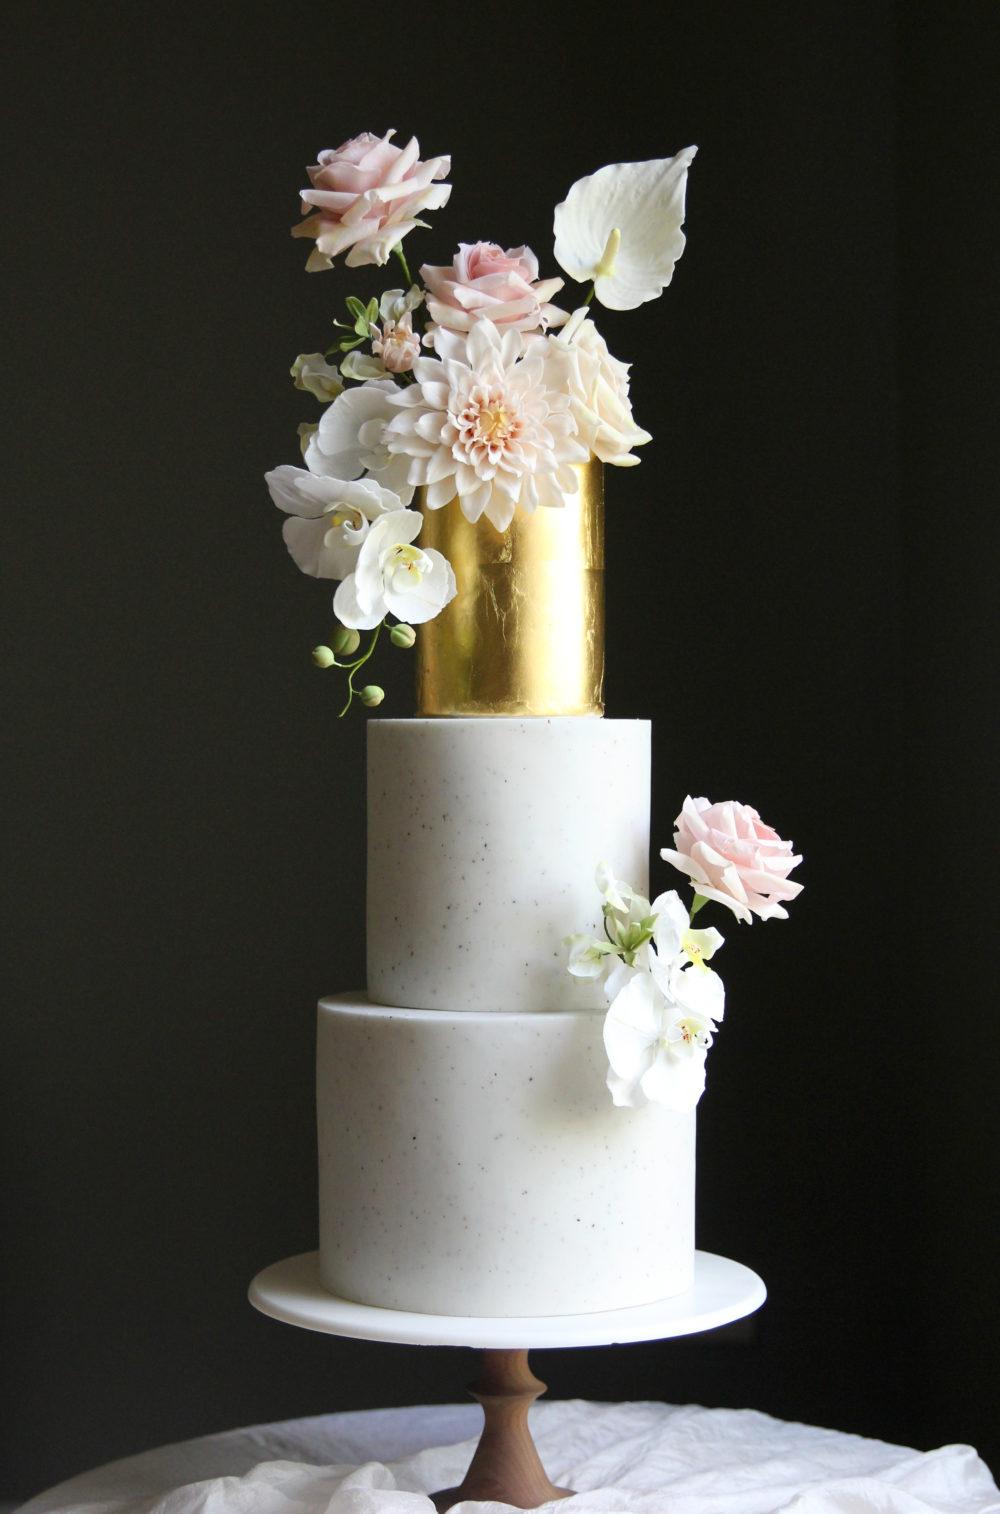 Golden Sugarflowers Wedding Cake Cove Cake Design